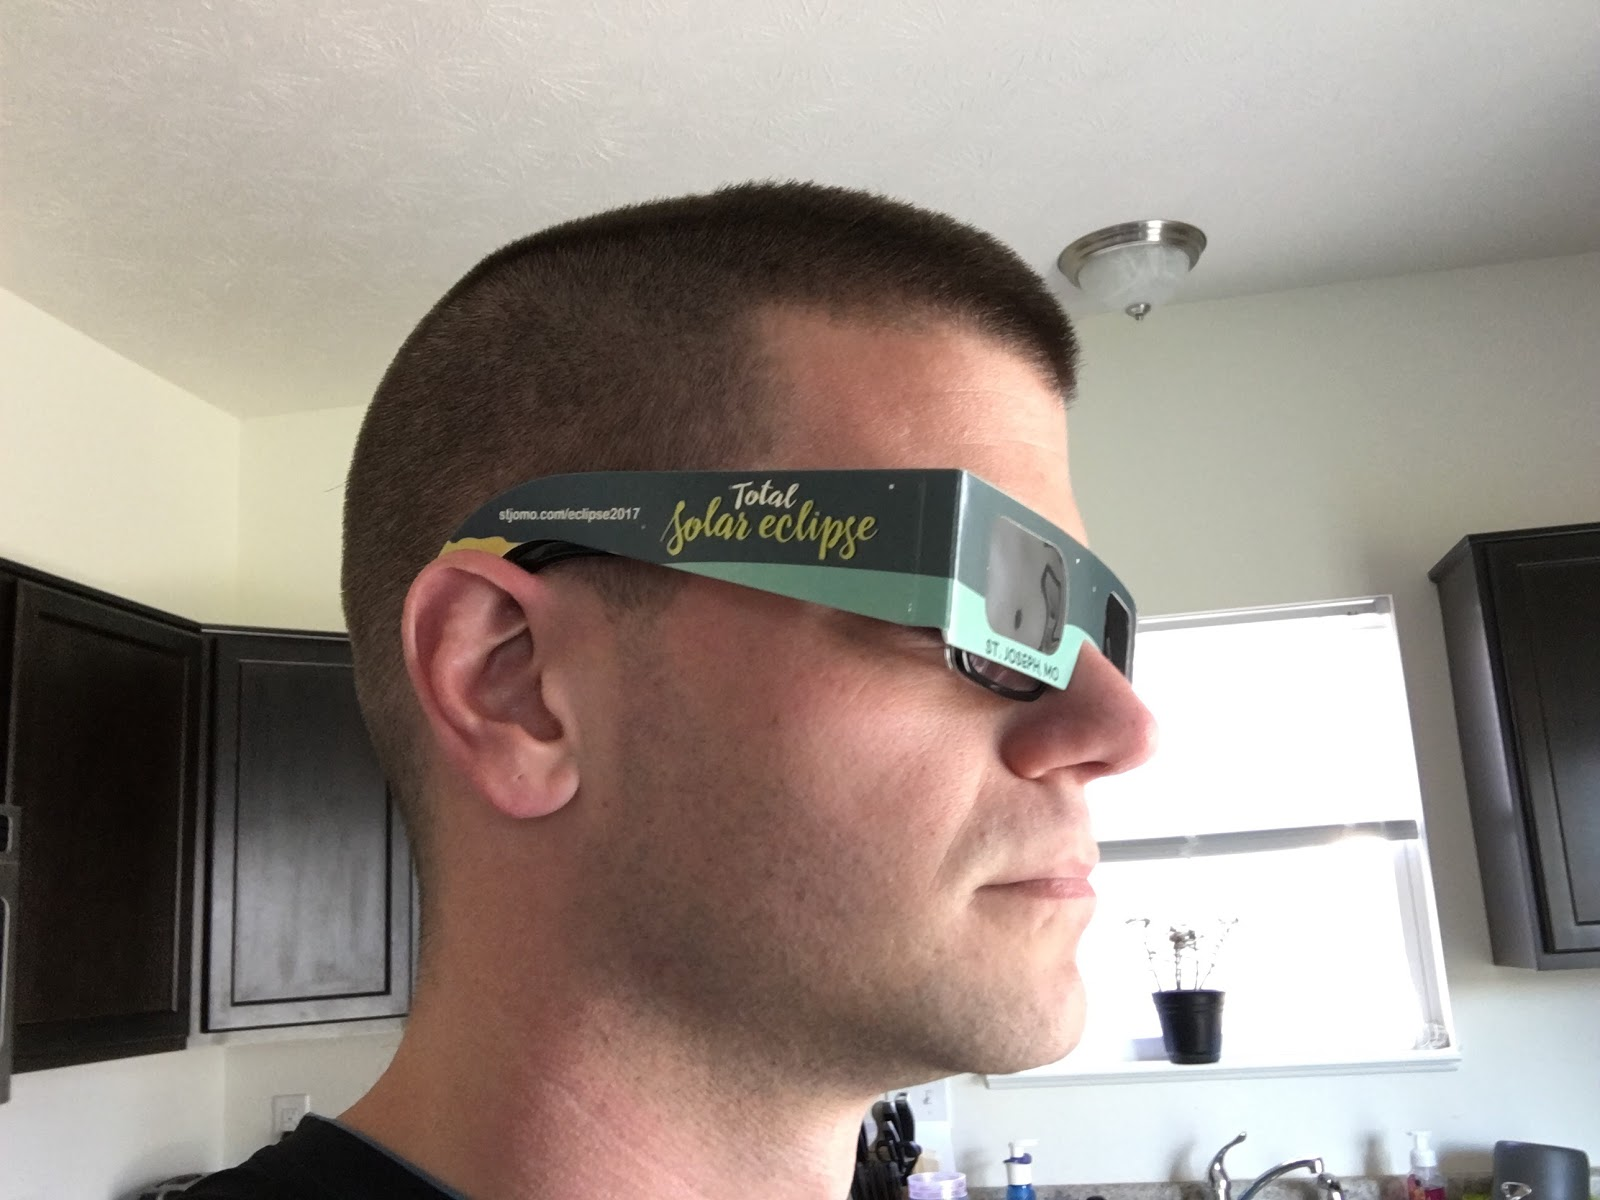 Do Solar Eclipse Glasses Fit And Work Over Regular Glasses